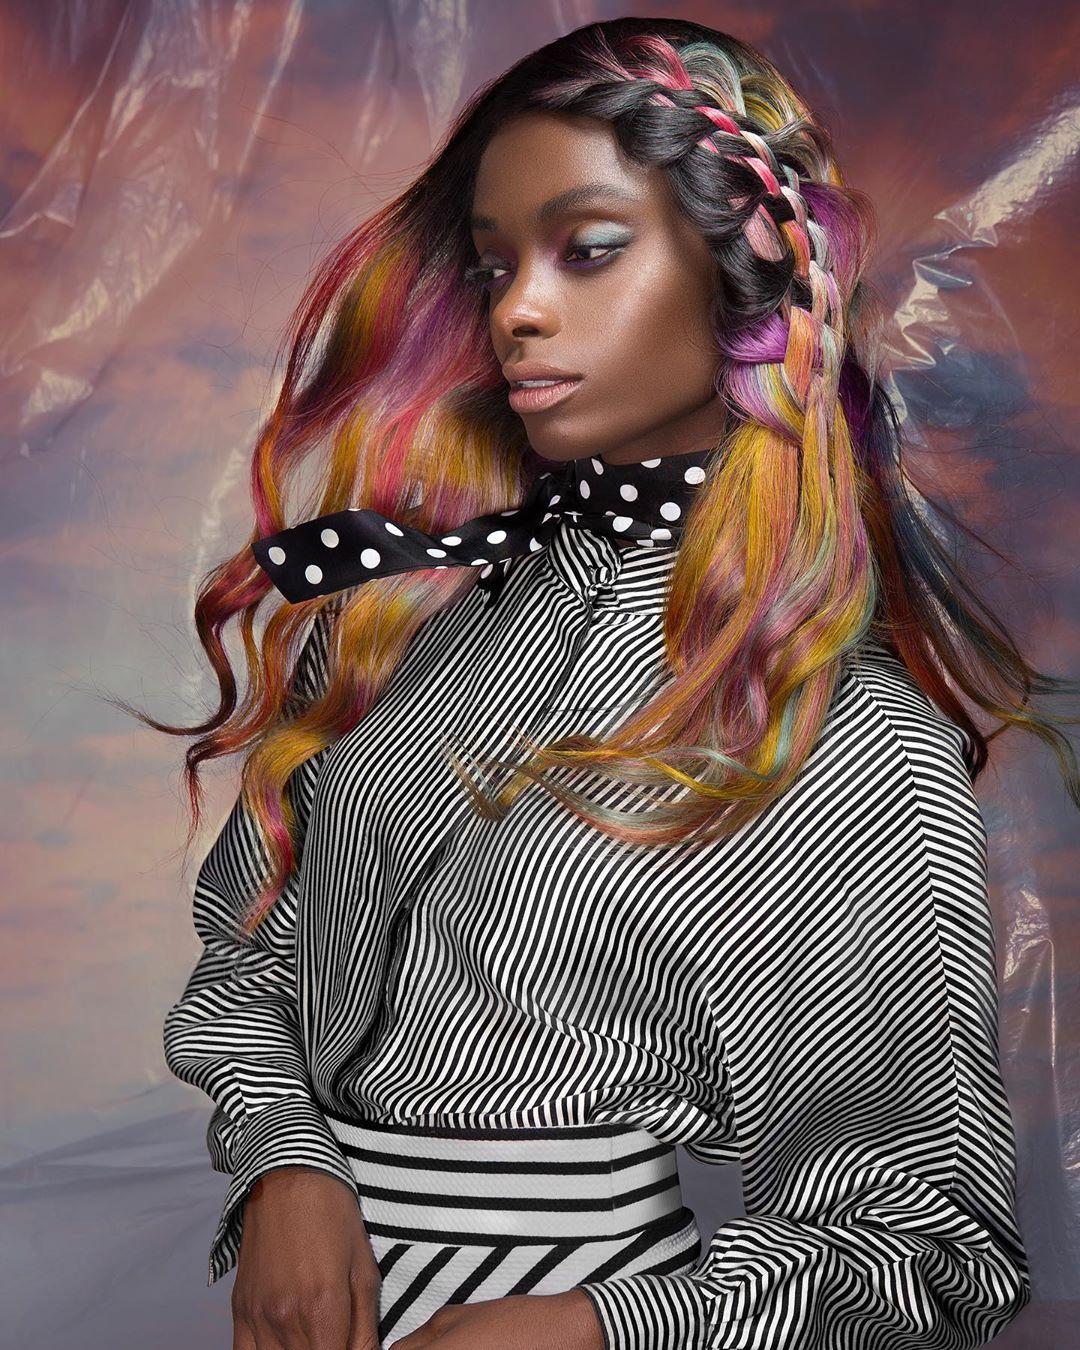 "Hair Stylist | Sarajane on Instagram: ""Rebecca Taylor x Studio Sage ℂ"